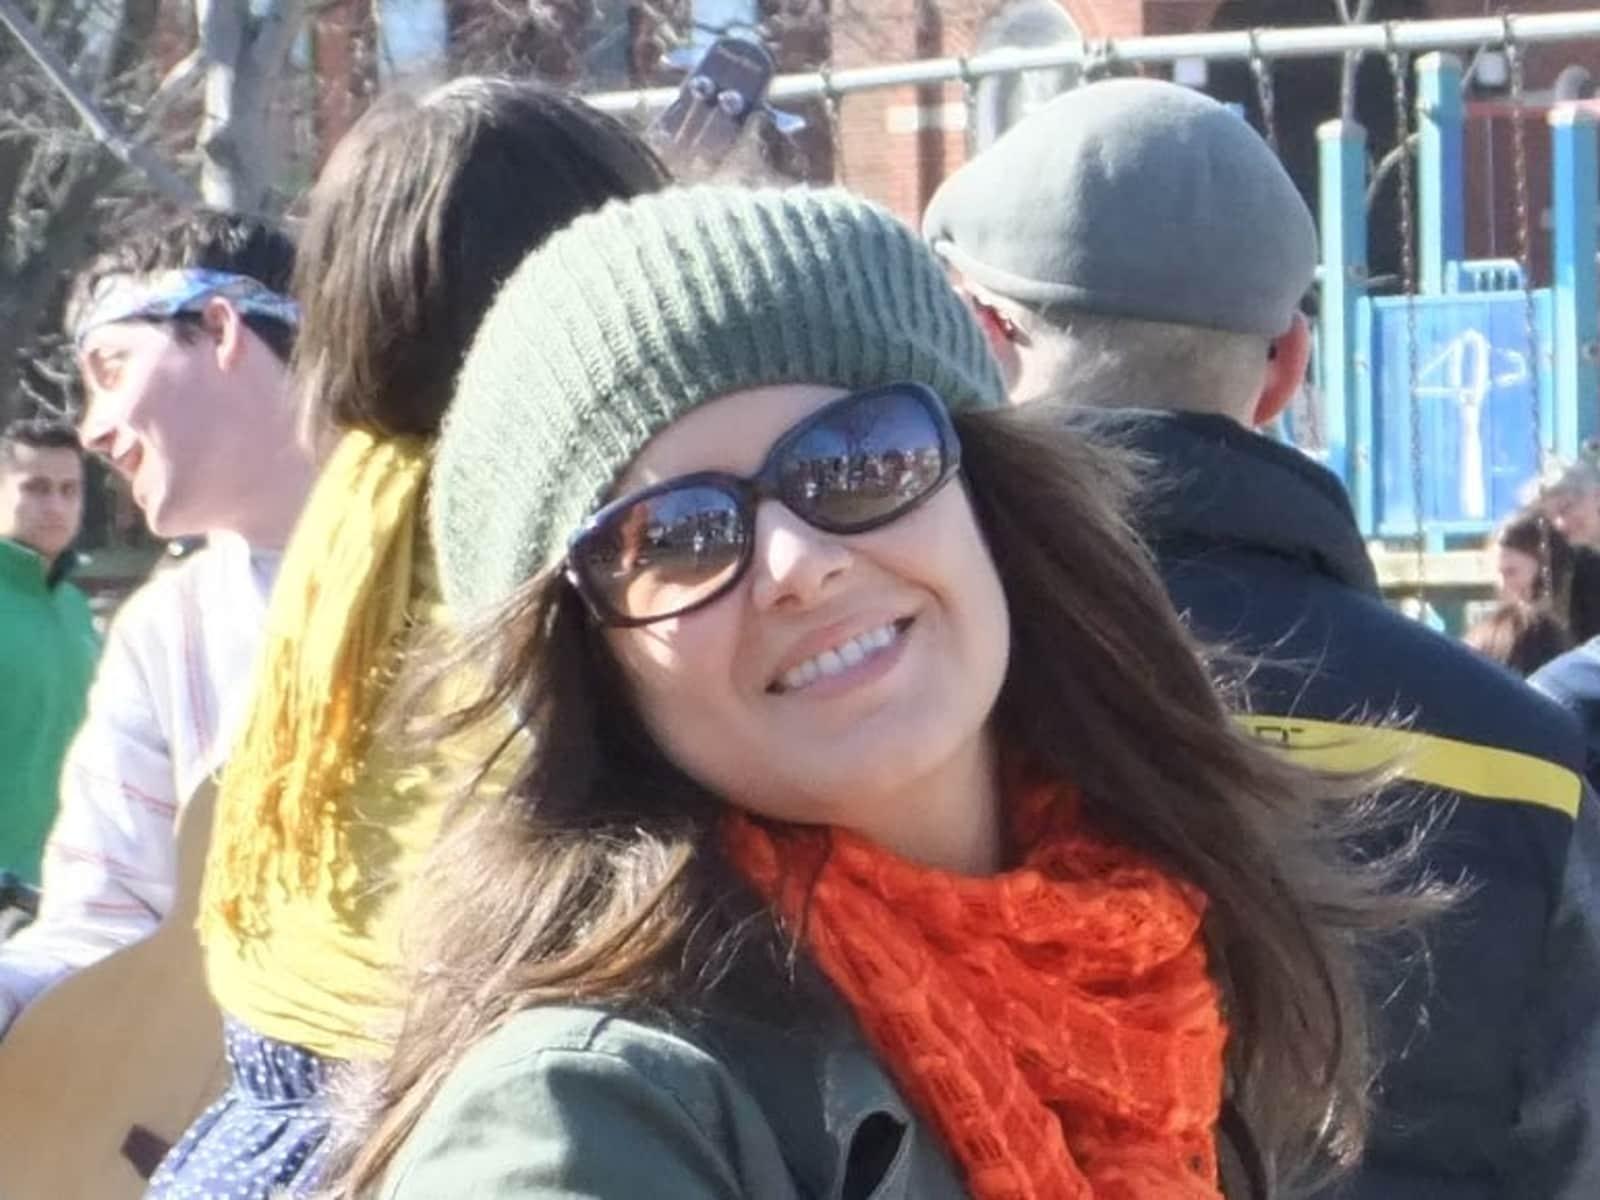 Michelle from Toronto, Ontario, Canada